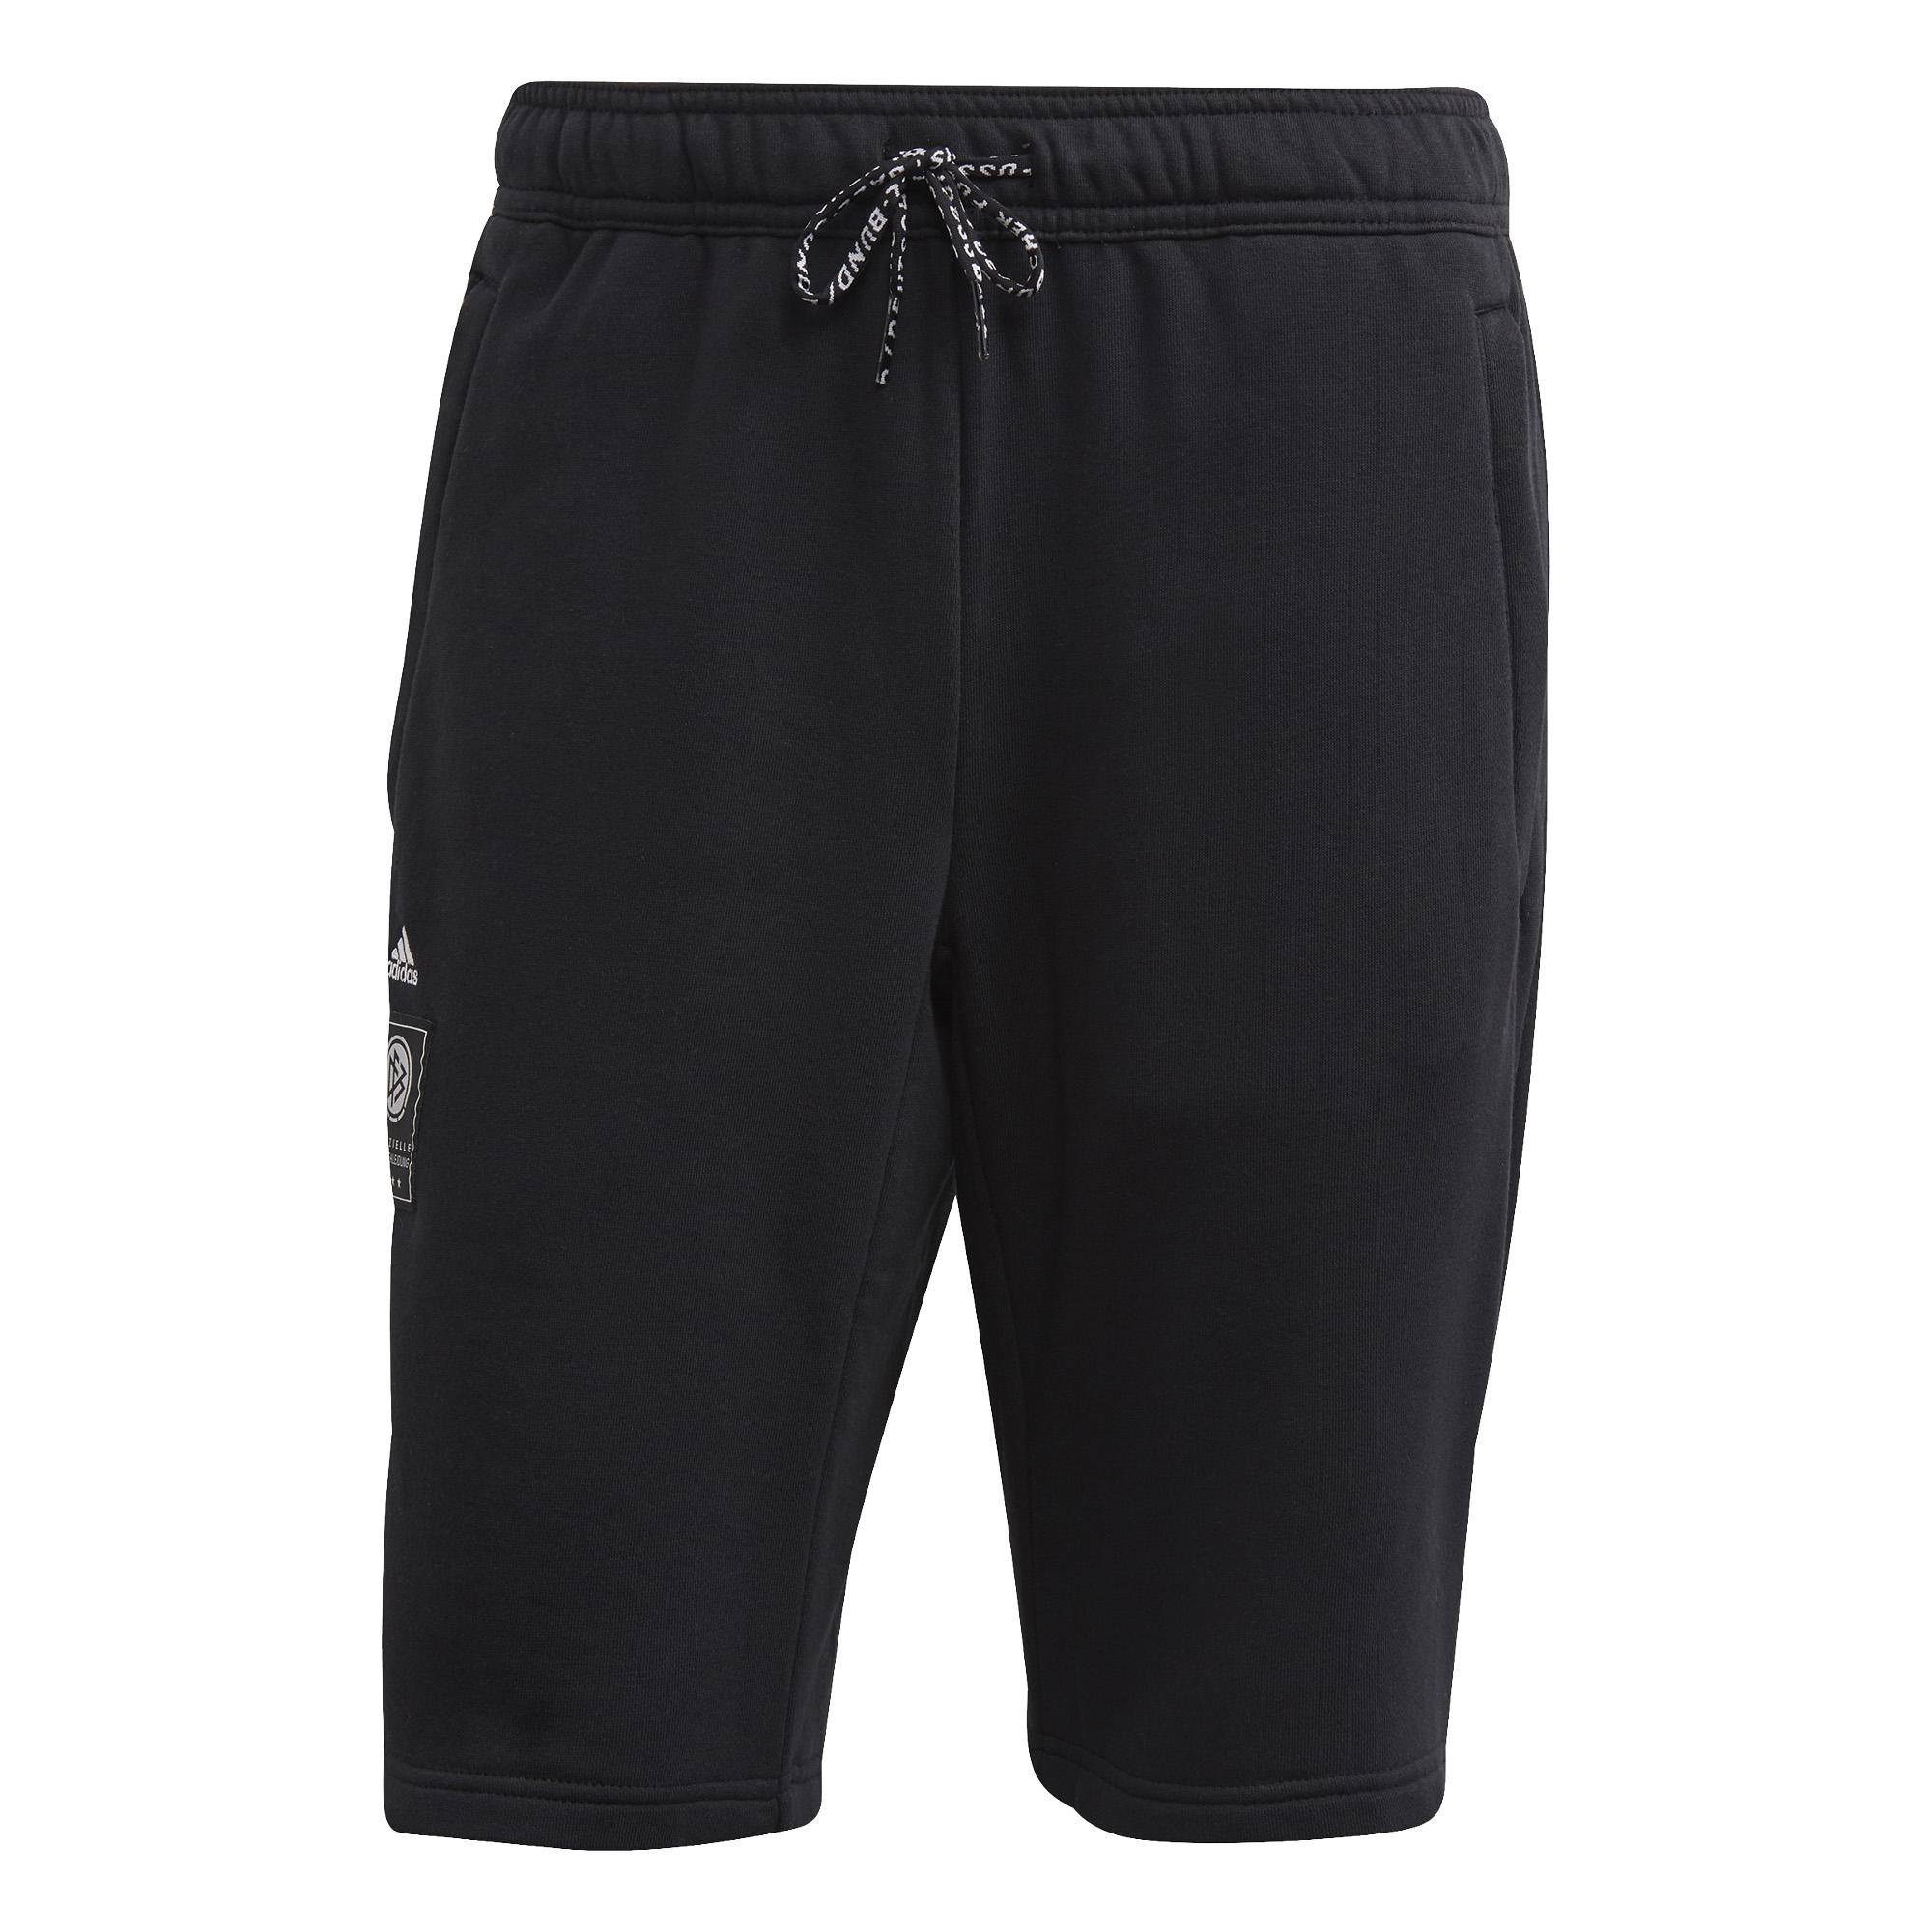 Germany SSP Sweat Shorts - Black